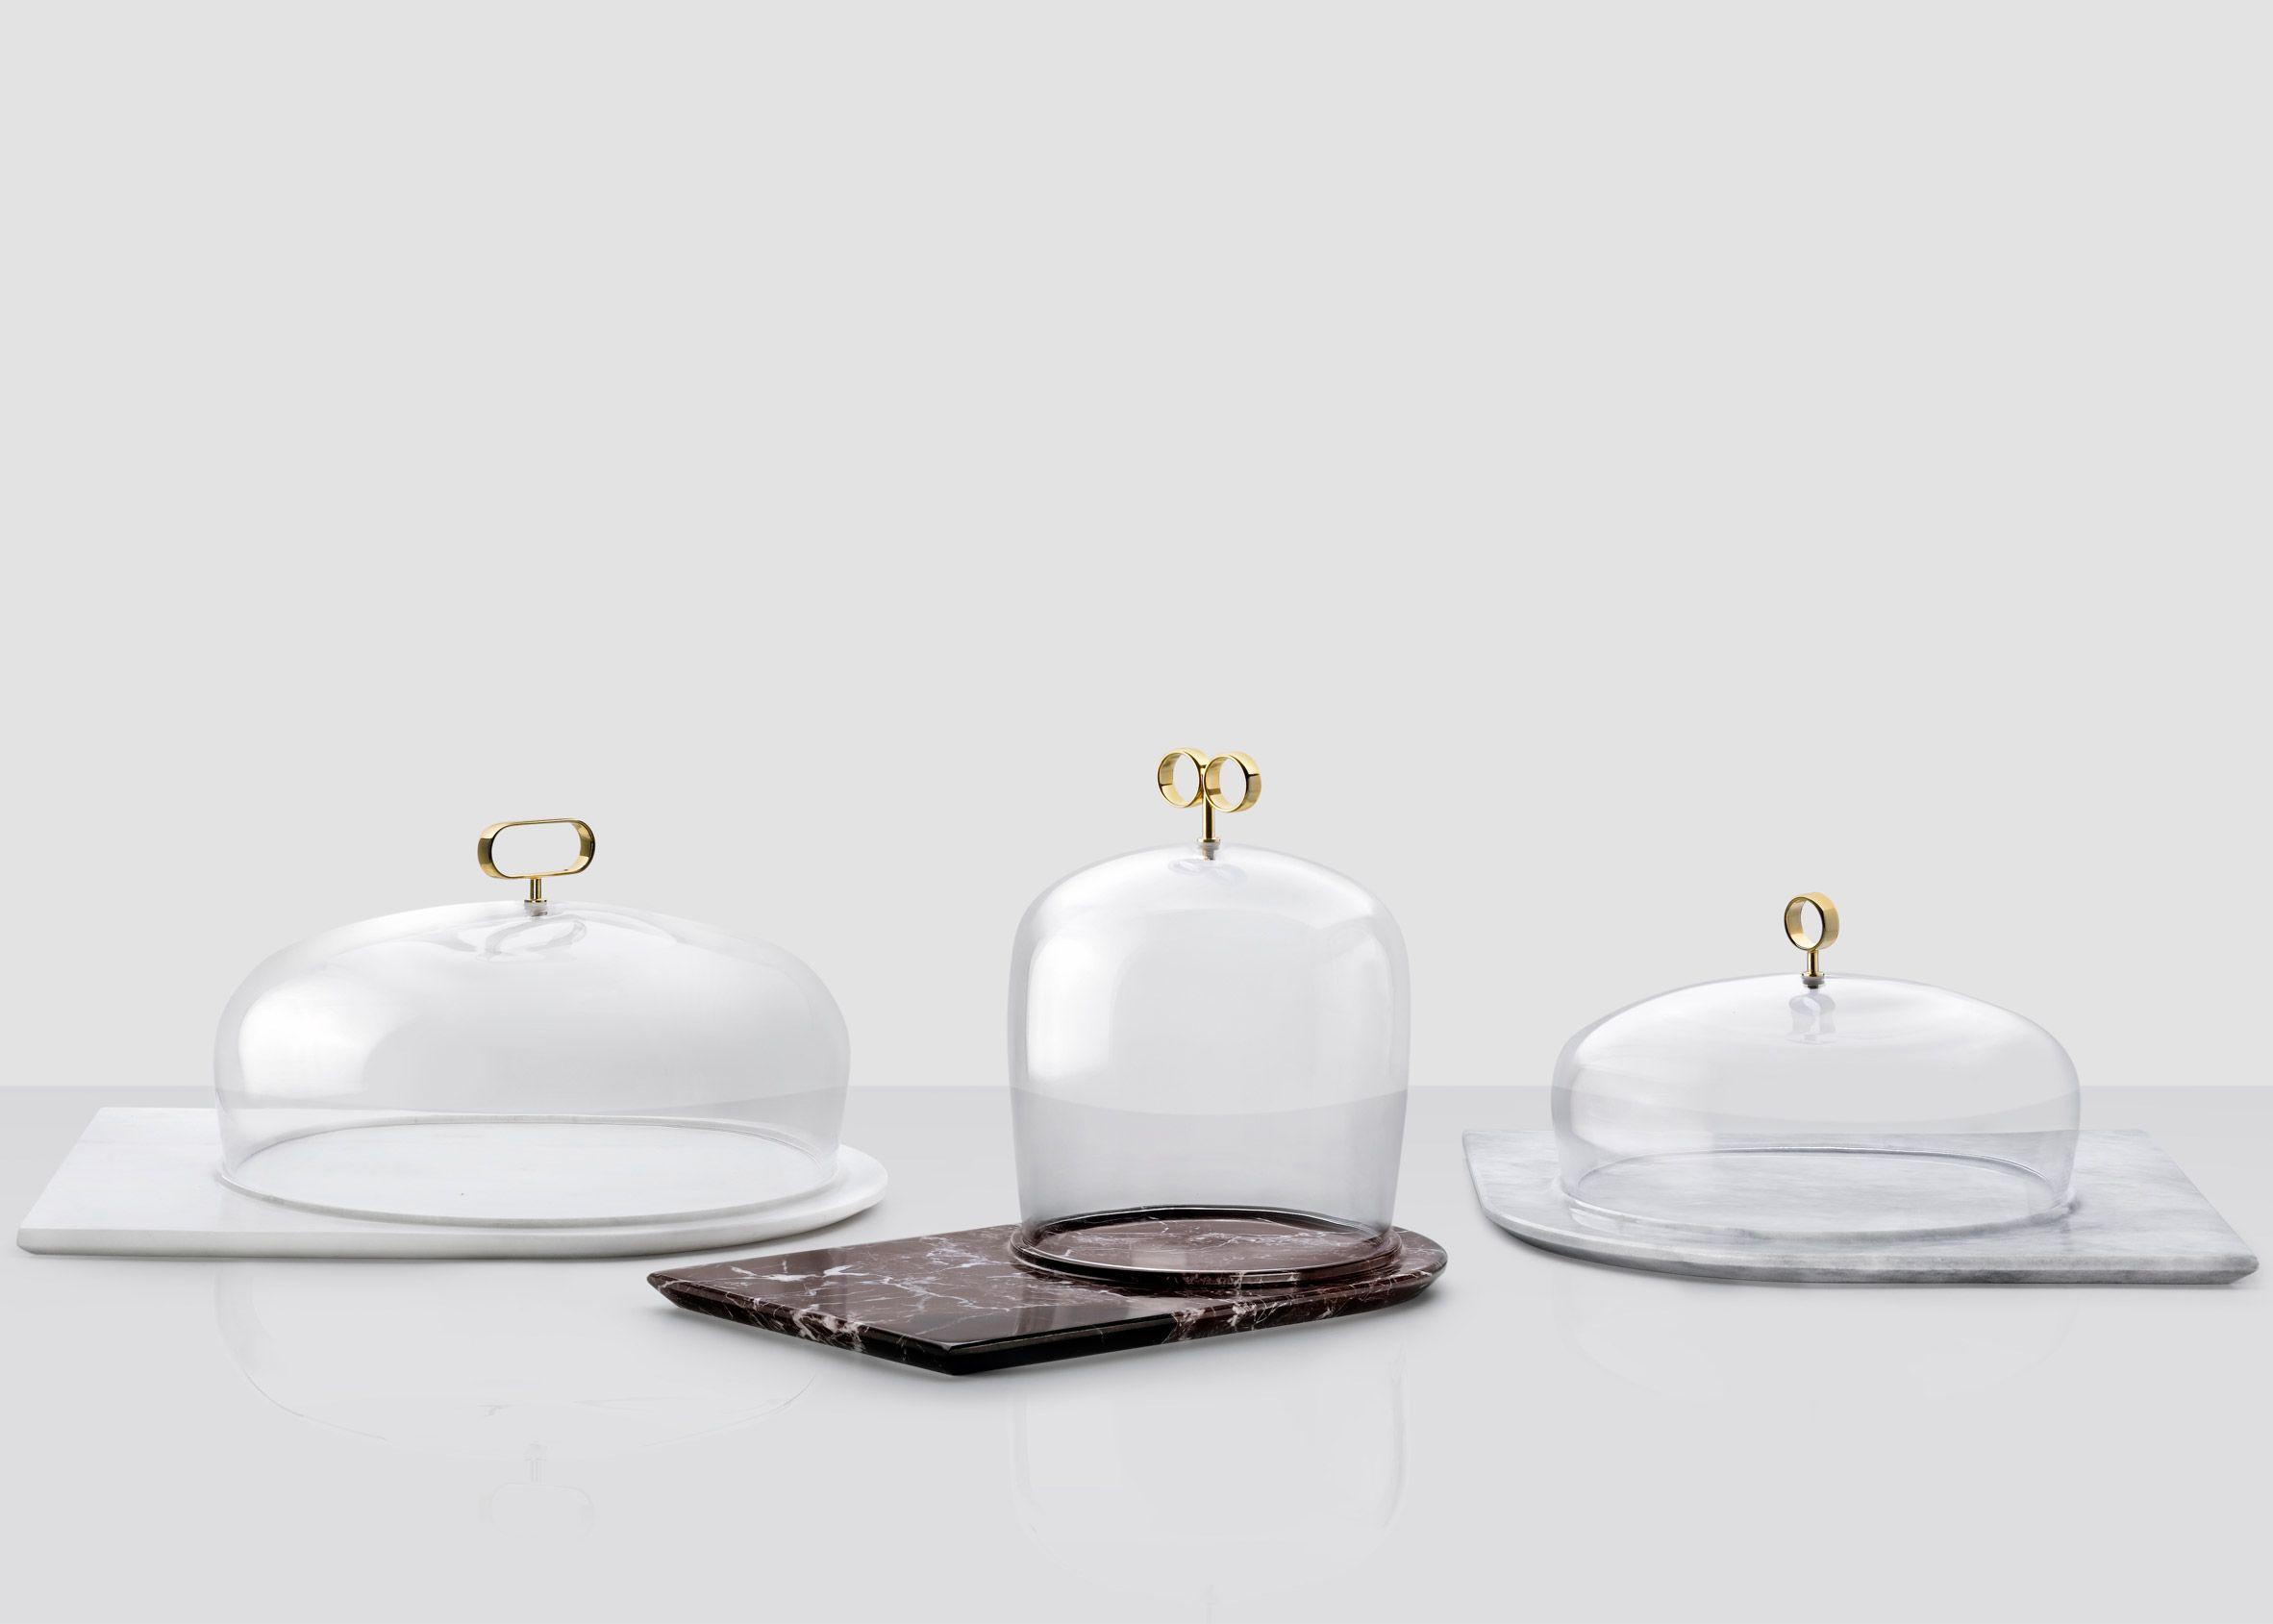 Joe Doucet and Inga Sempé design glassware for Nude